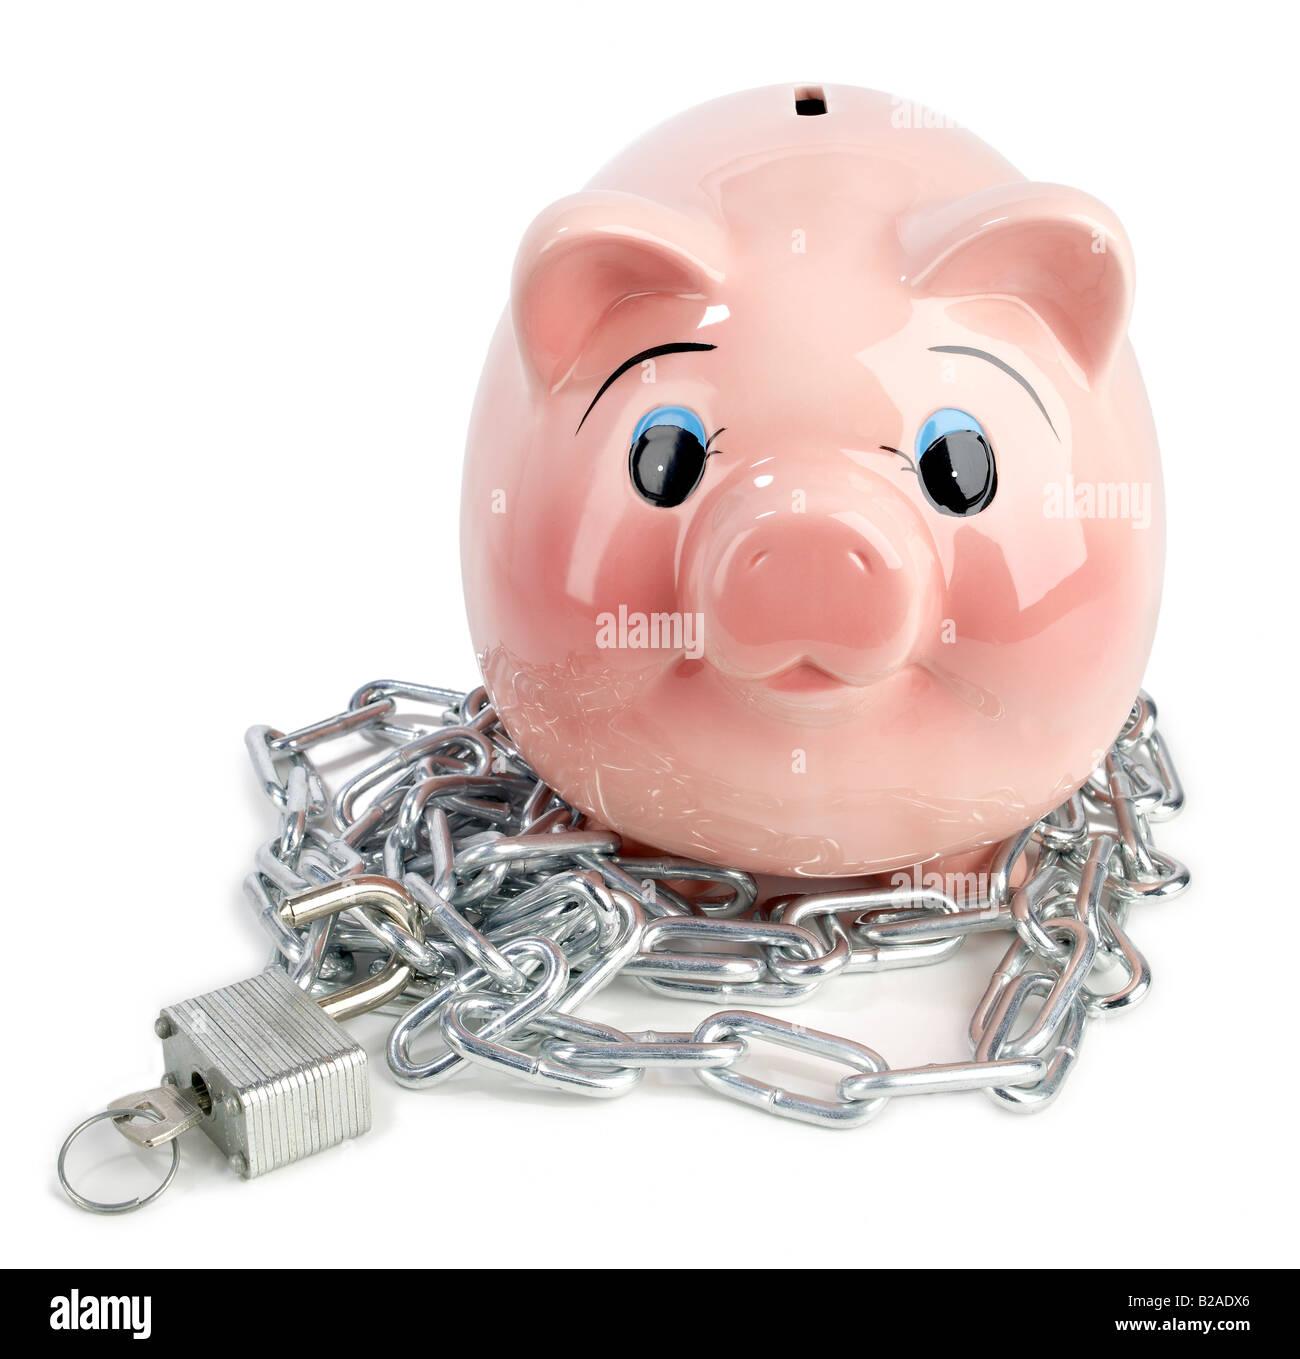 Piggy bank chain lock - Stock Image